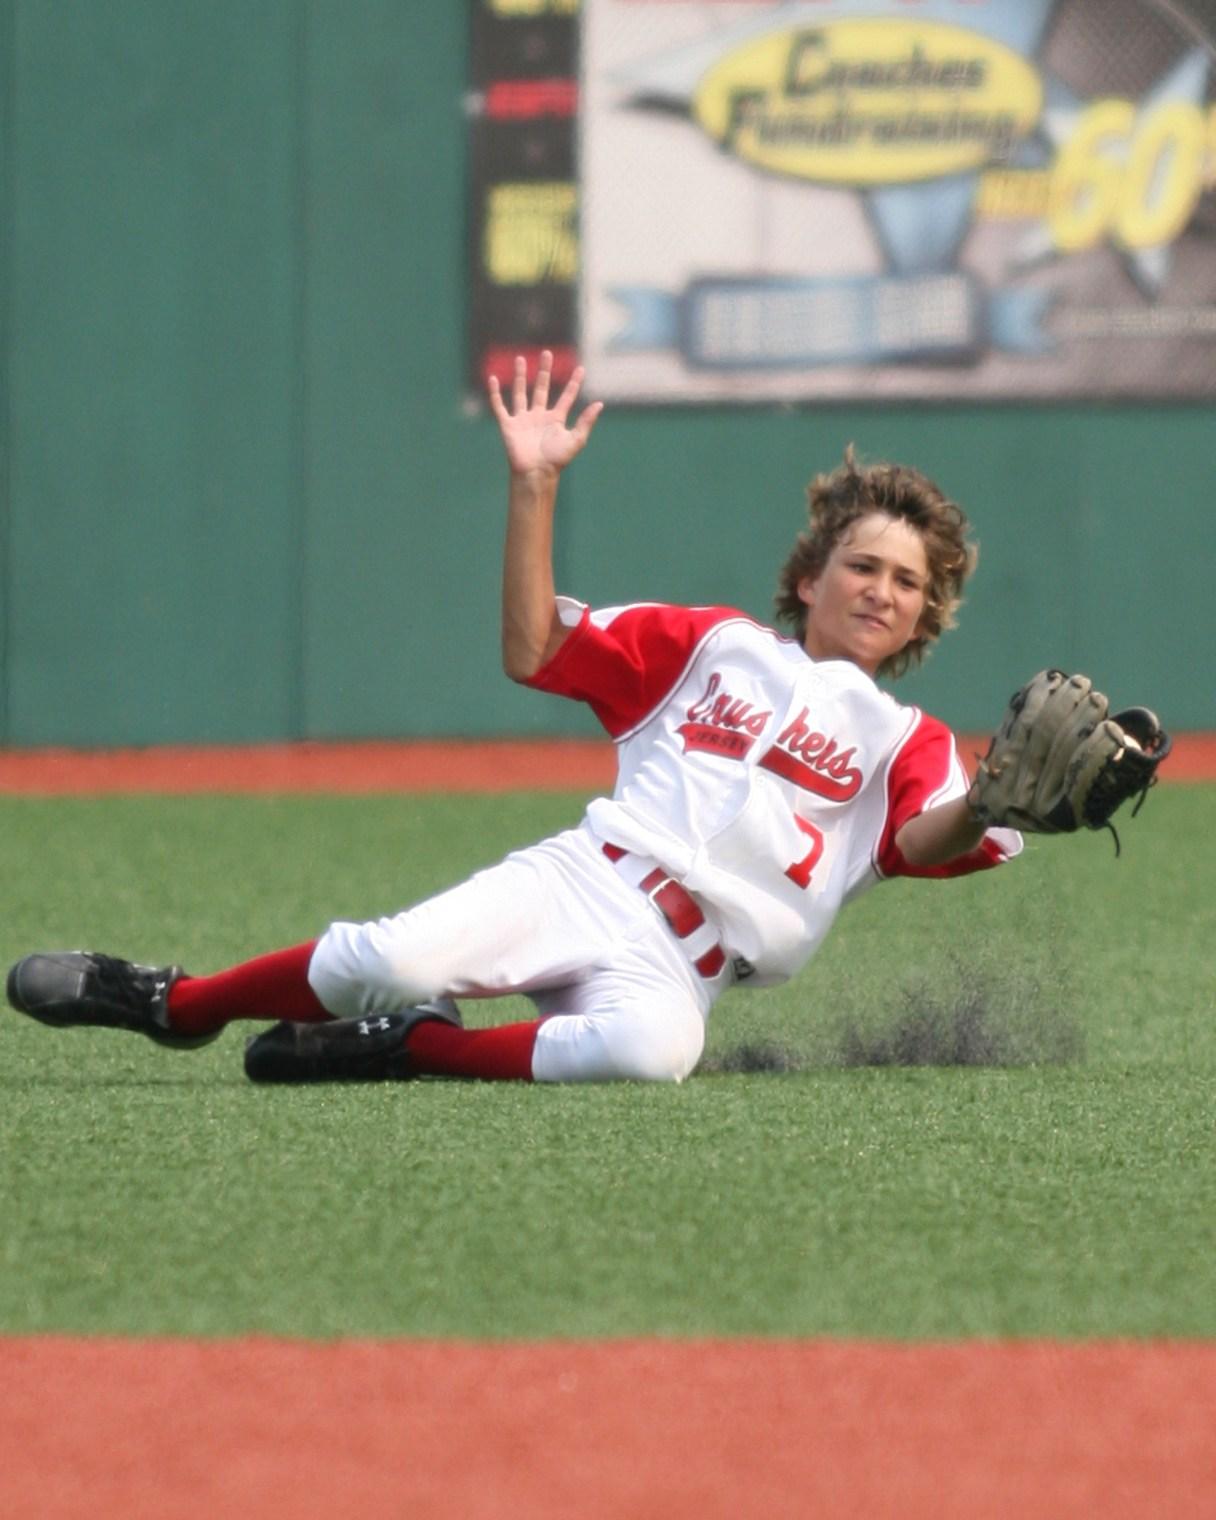 crop baseball